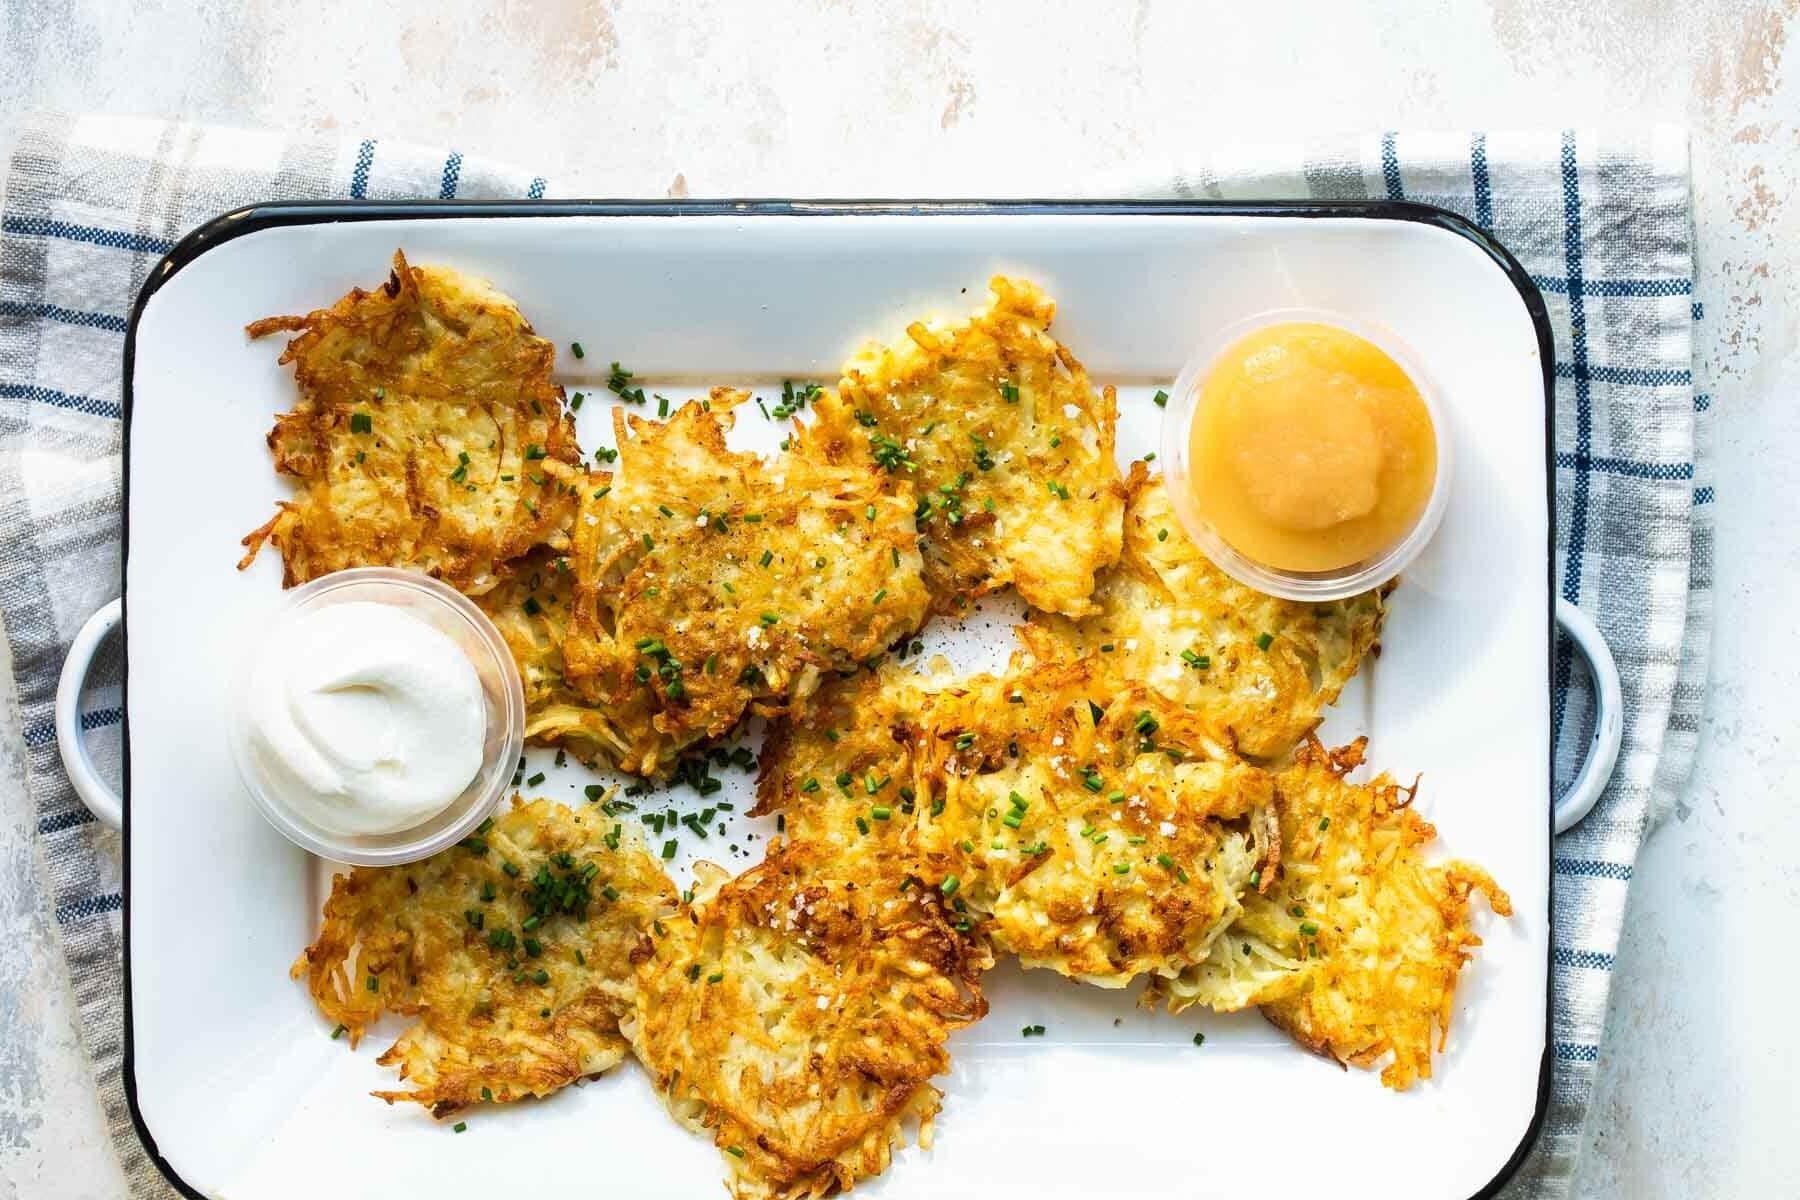 Potato latkes on a rectangular platter.